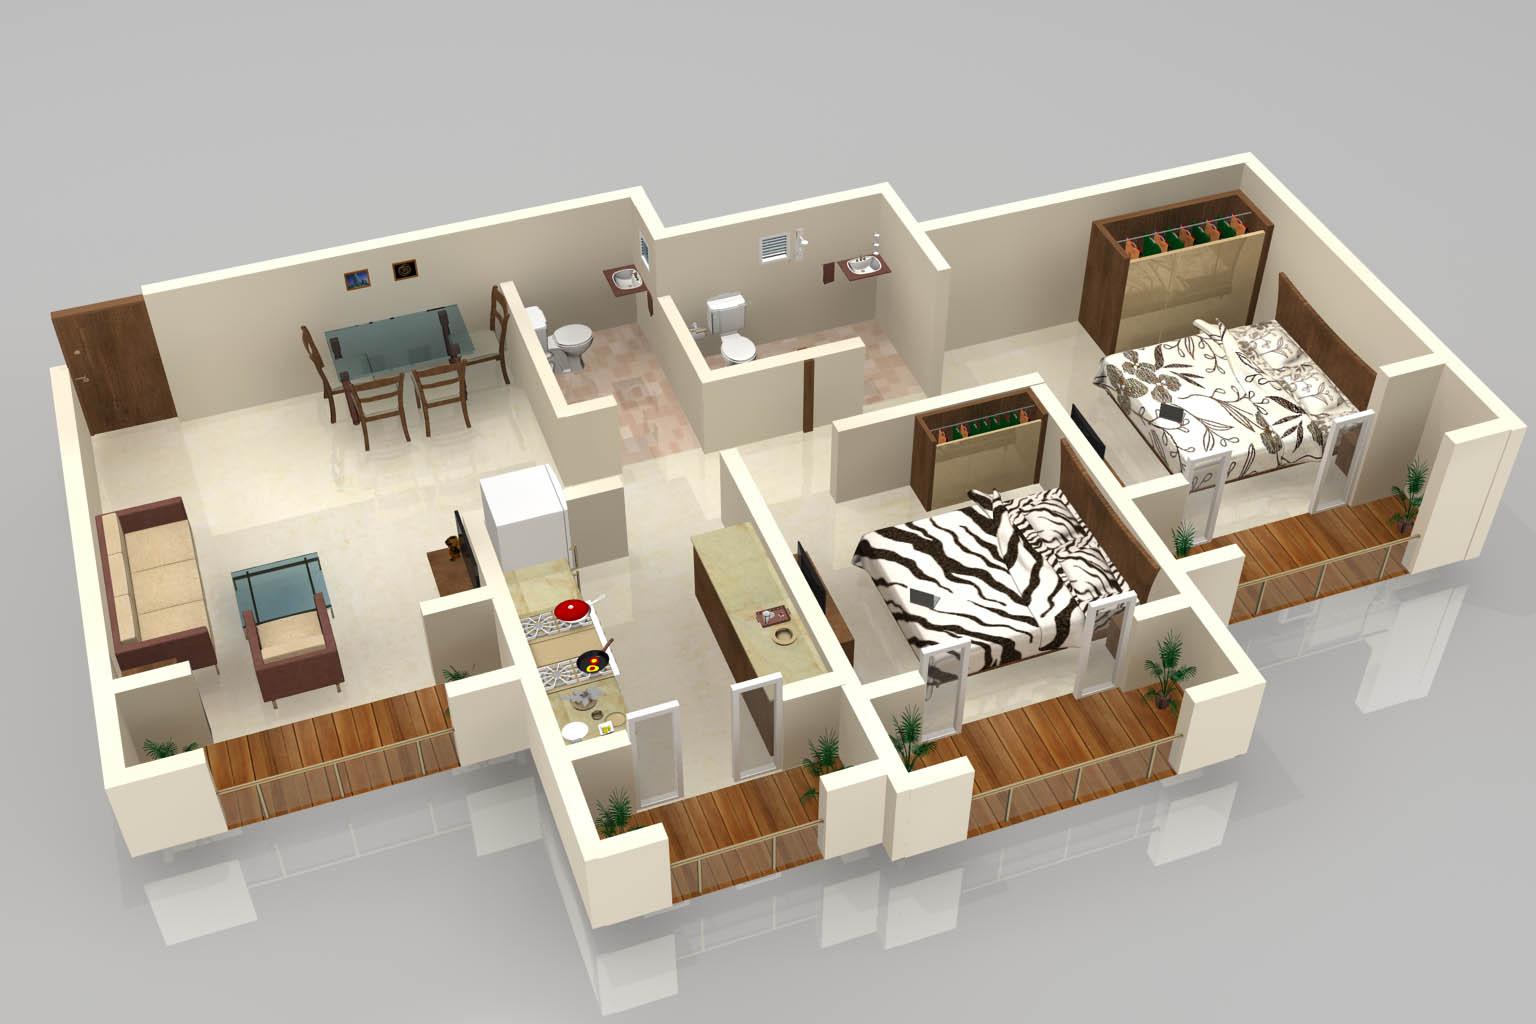 3D Floor Plan Of A Celeb Mansion  Modern House